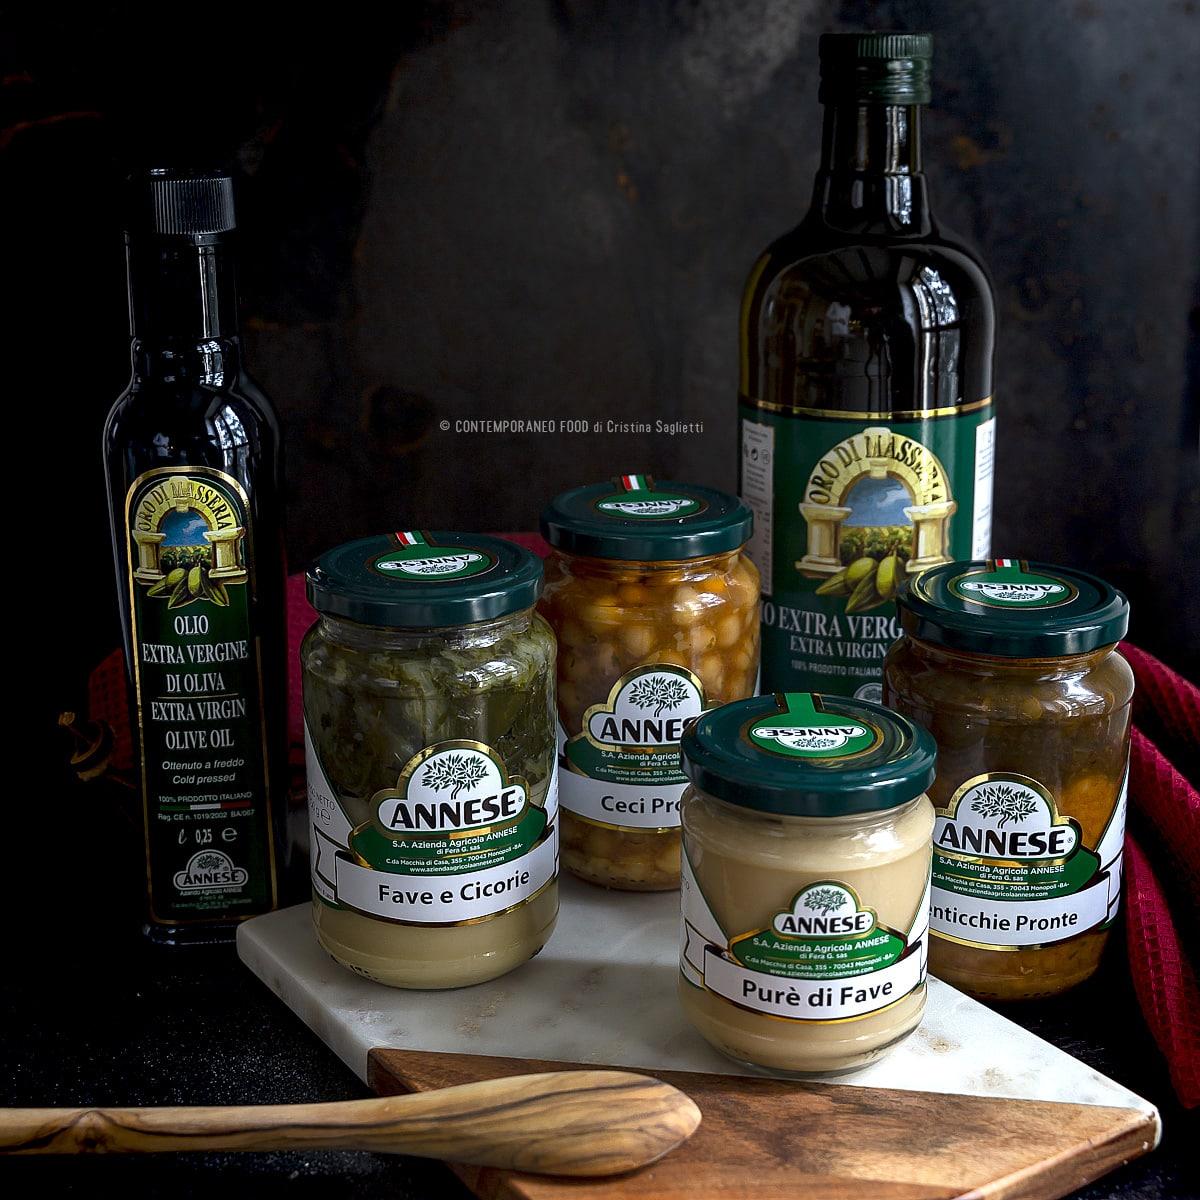 azienda-agricola-annese-puglia-contemporaneo-food-influencer-piemonte